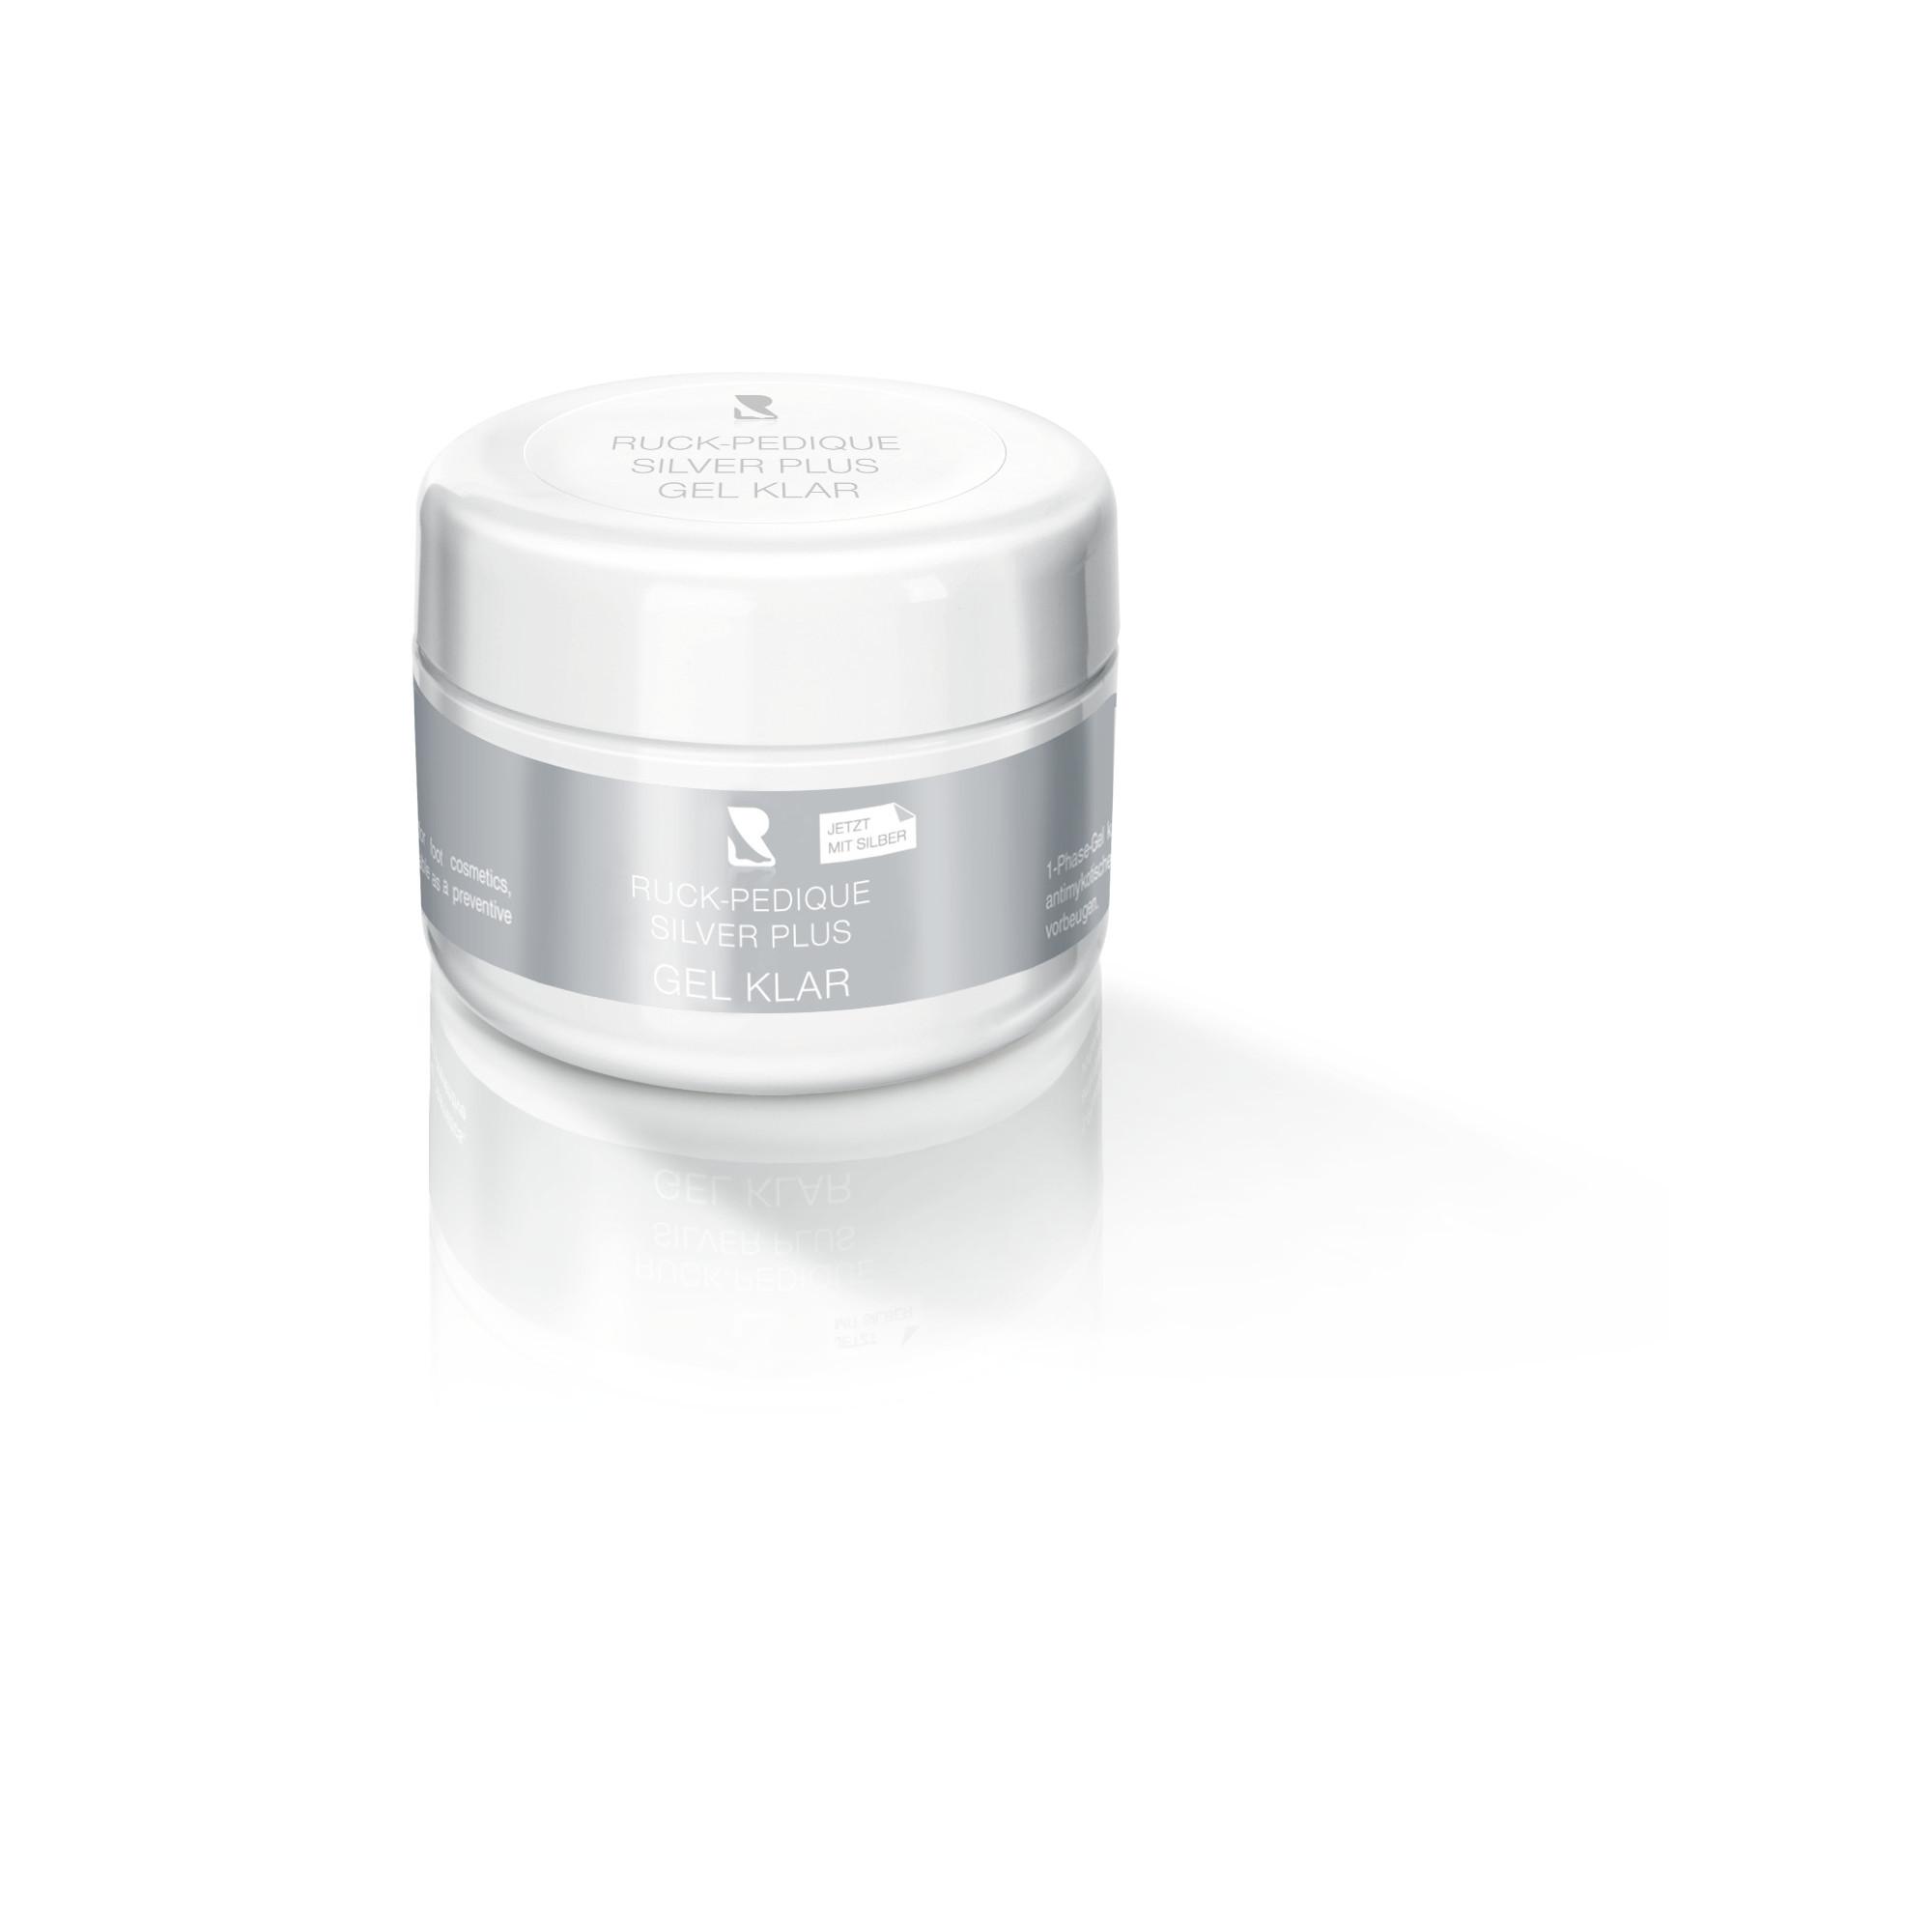 Nettoyant - 100 ml - Ruck